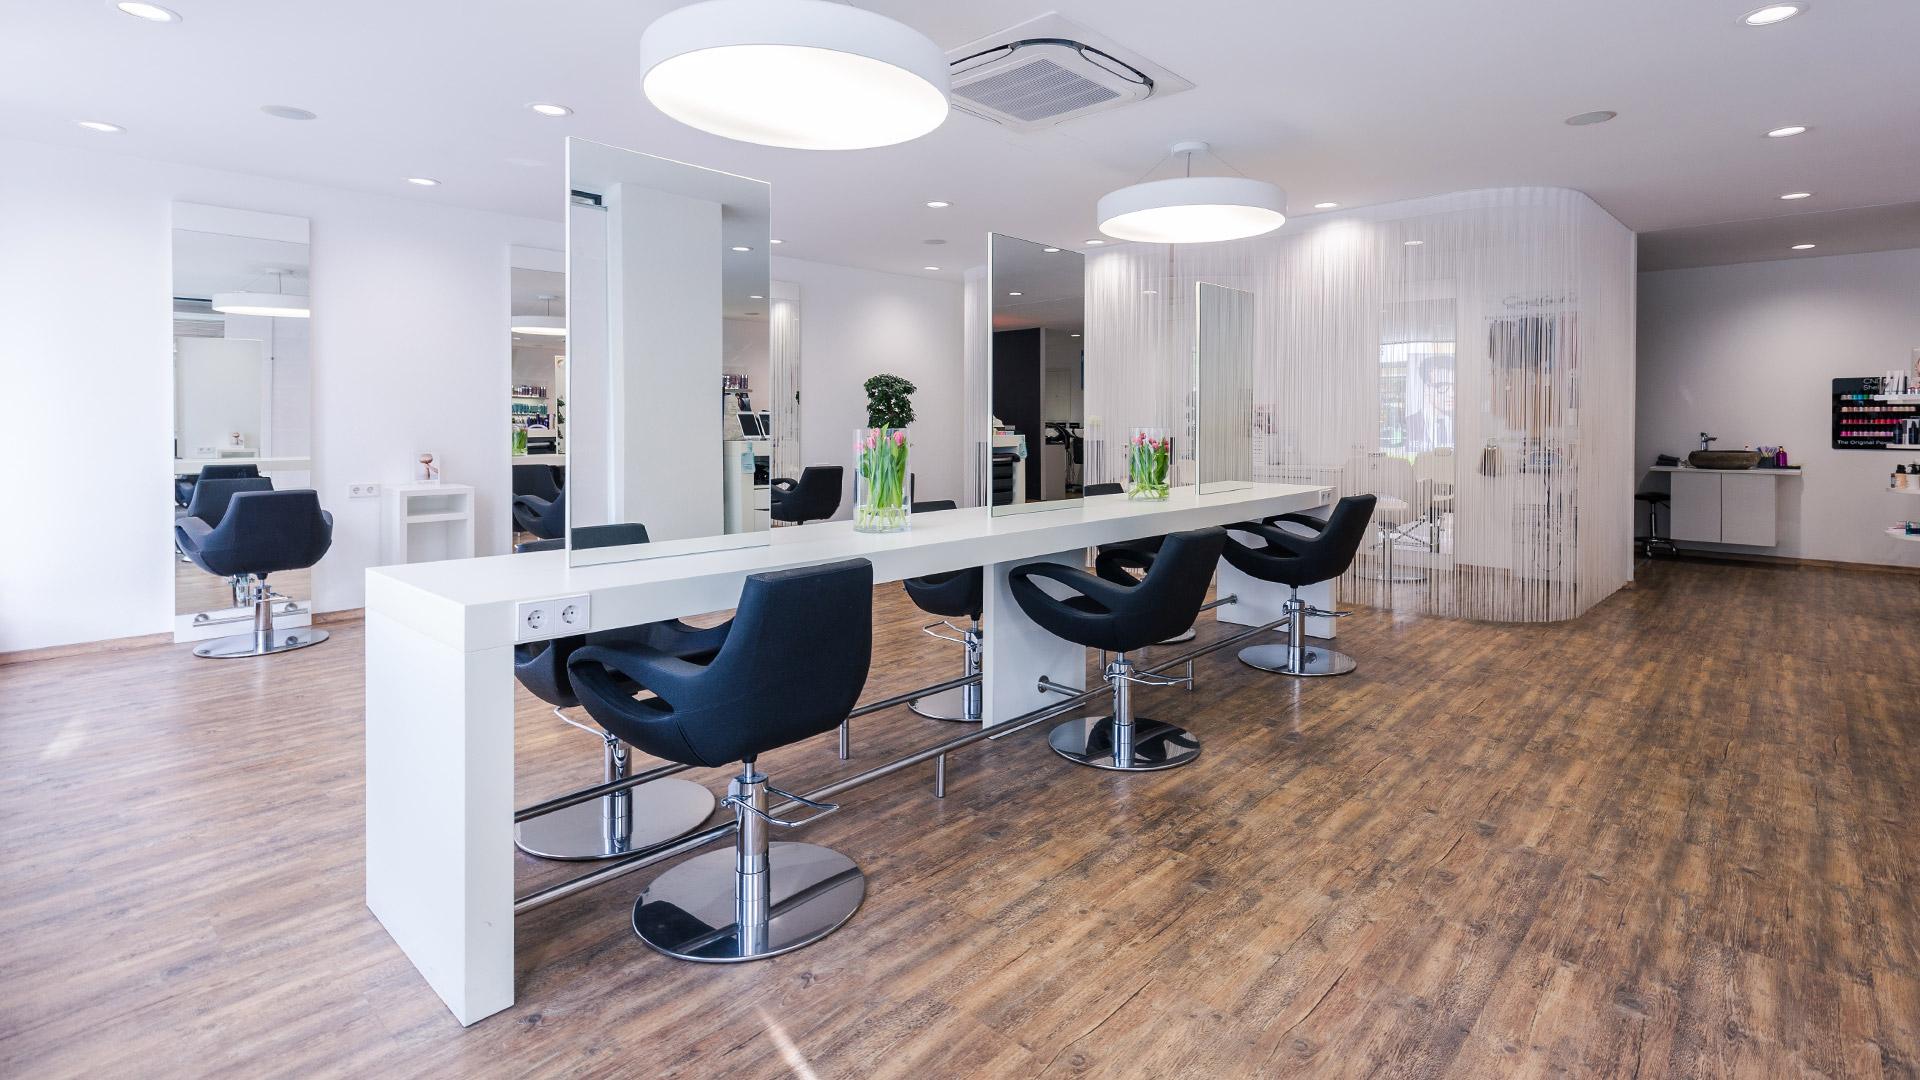 PJs Hair & Style - Website - Bilder - Salon 1